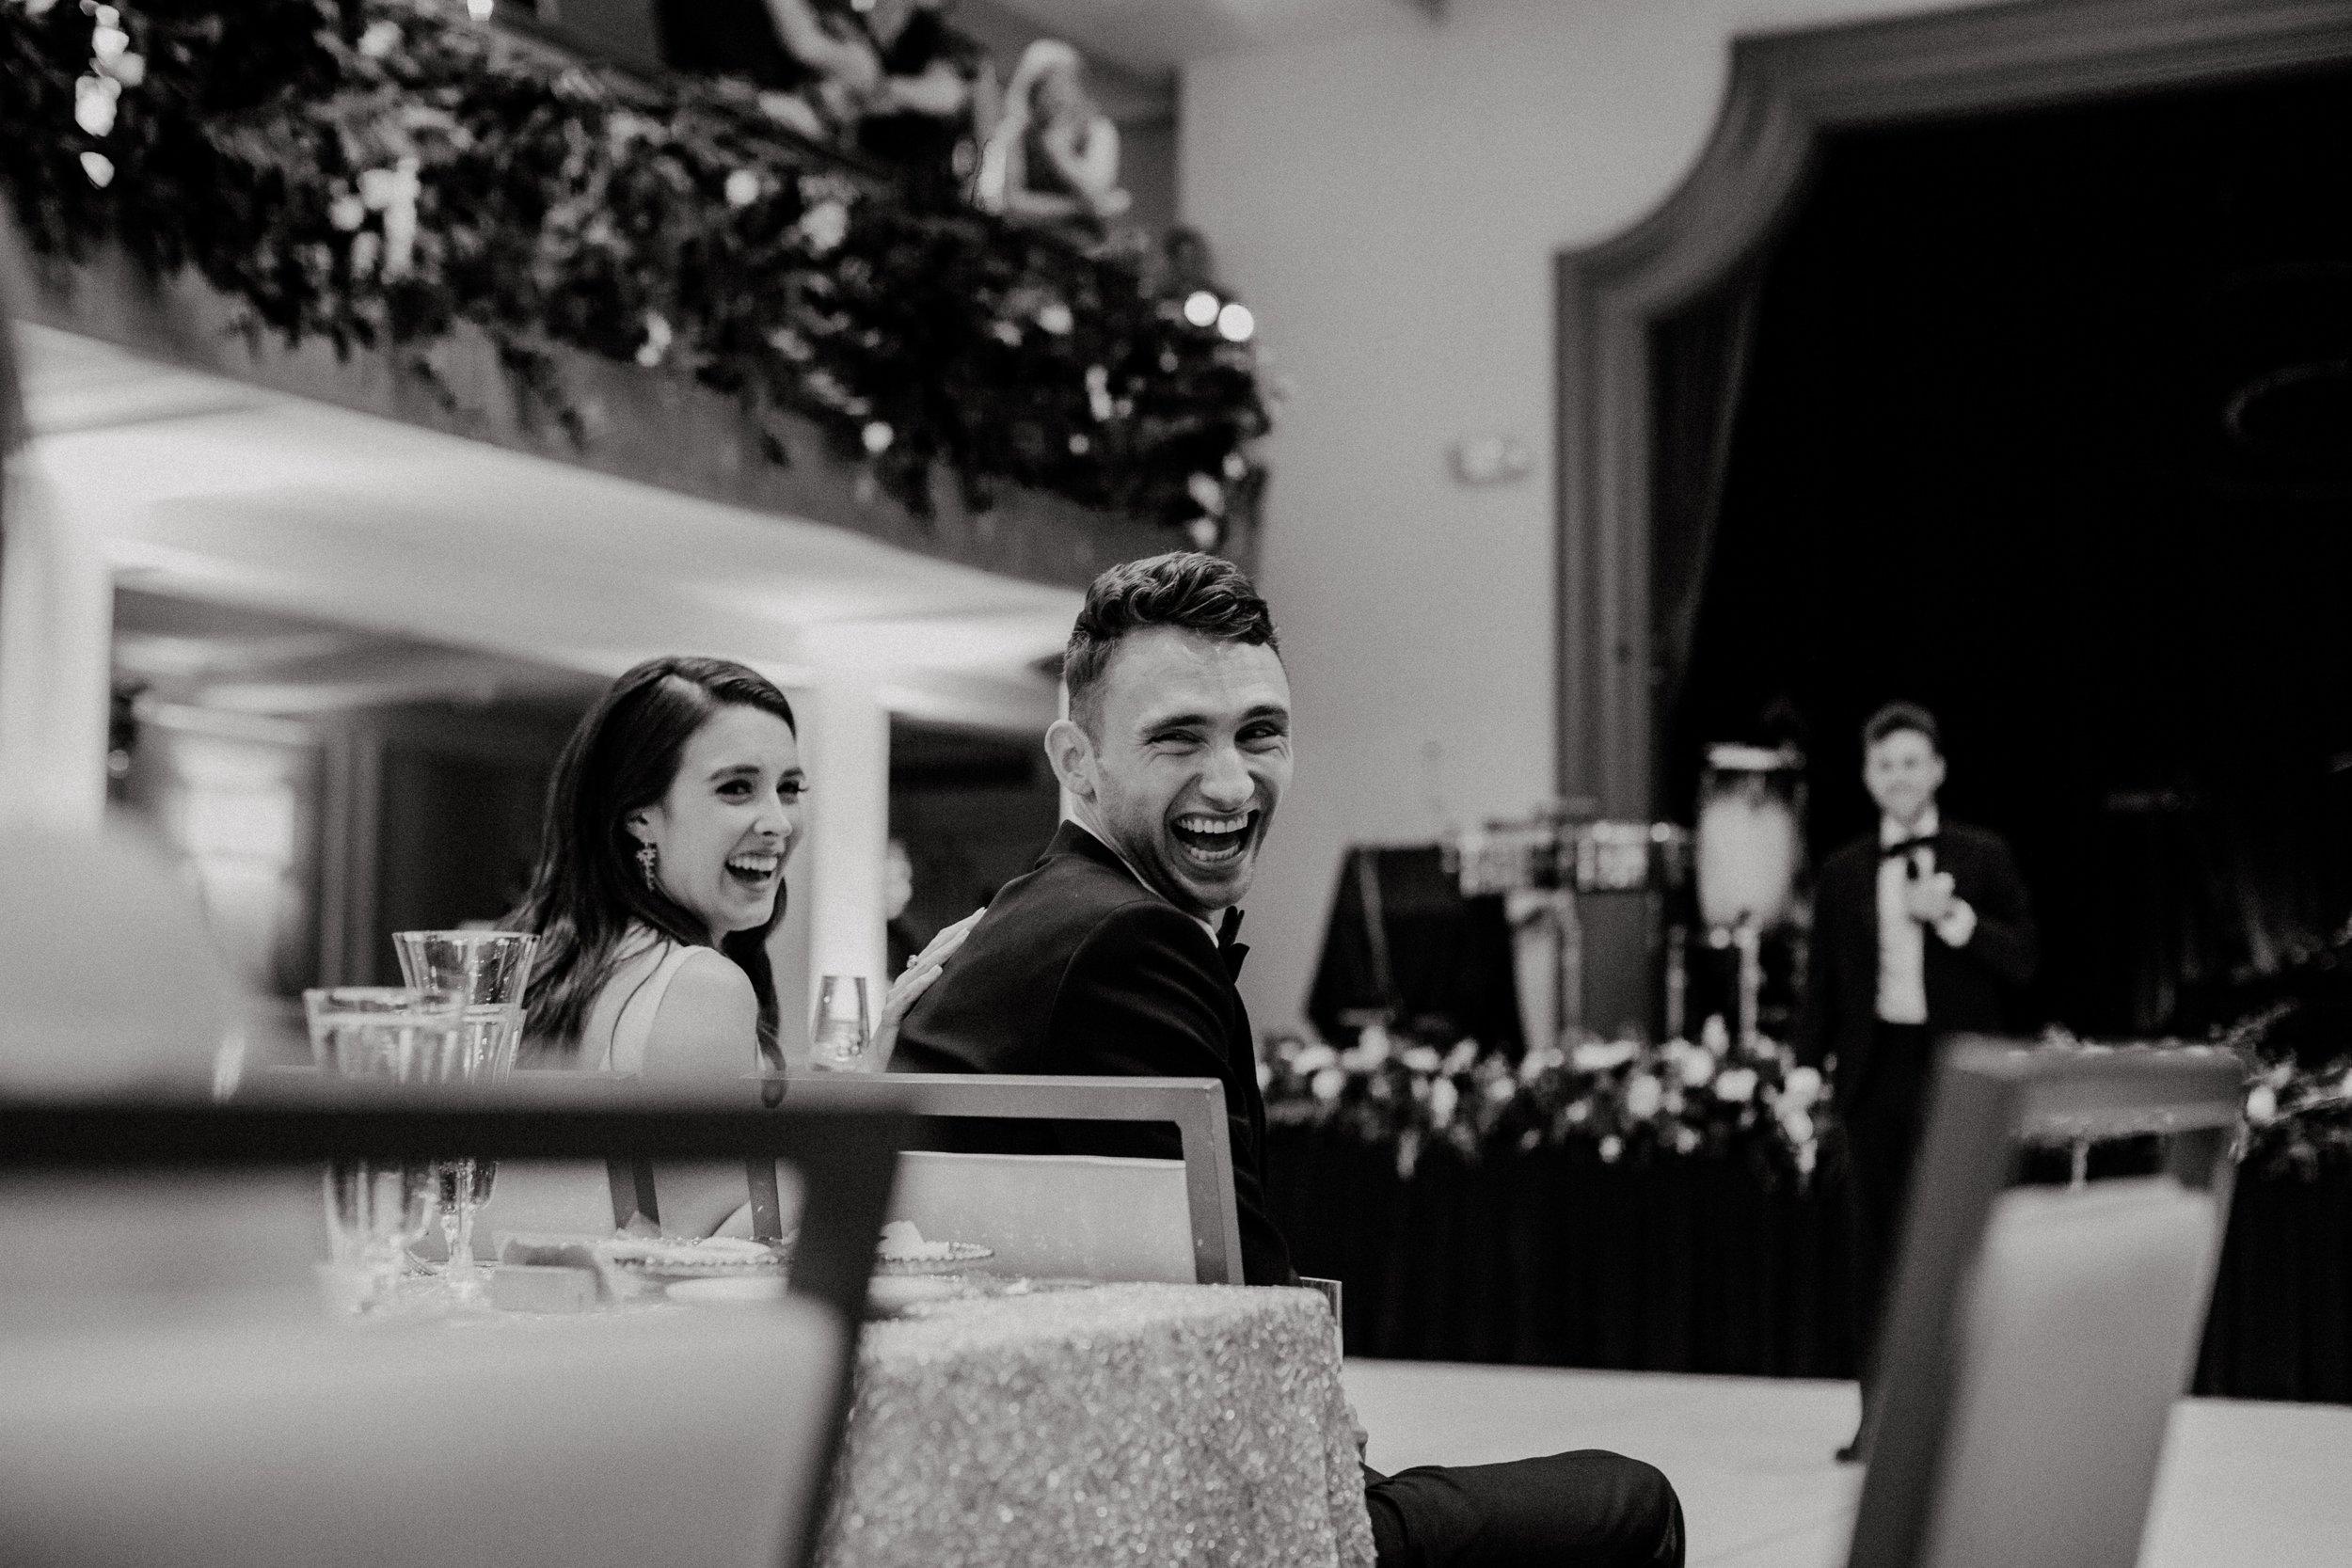 st-anthony-hotel-wedding-photography-10150san-antonio.JPG